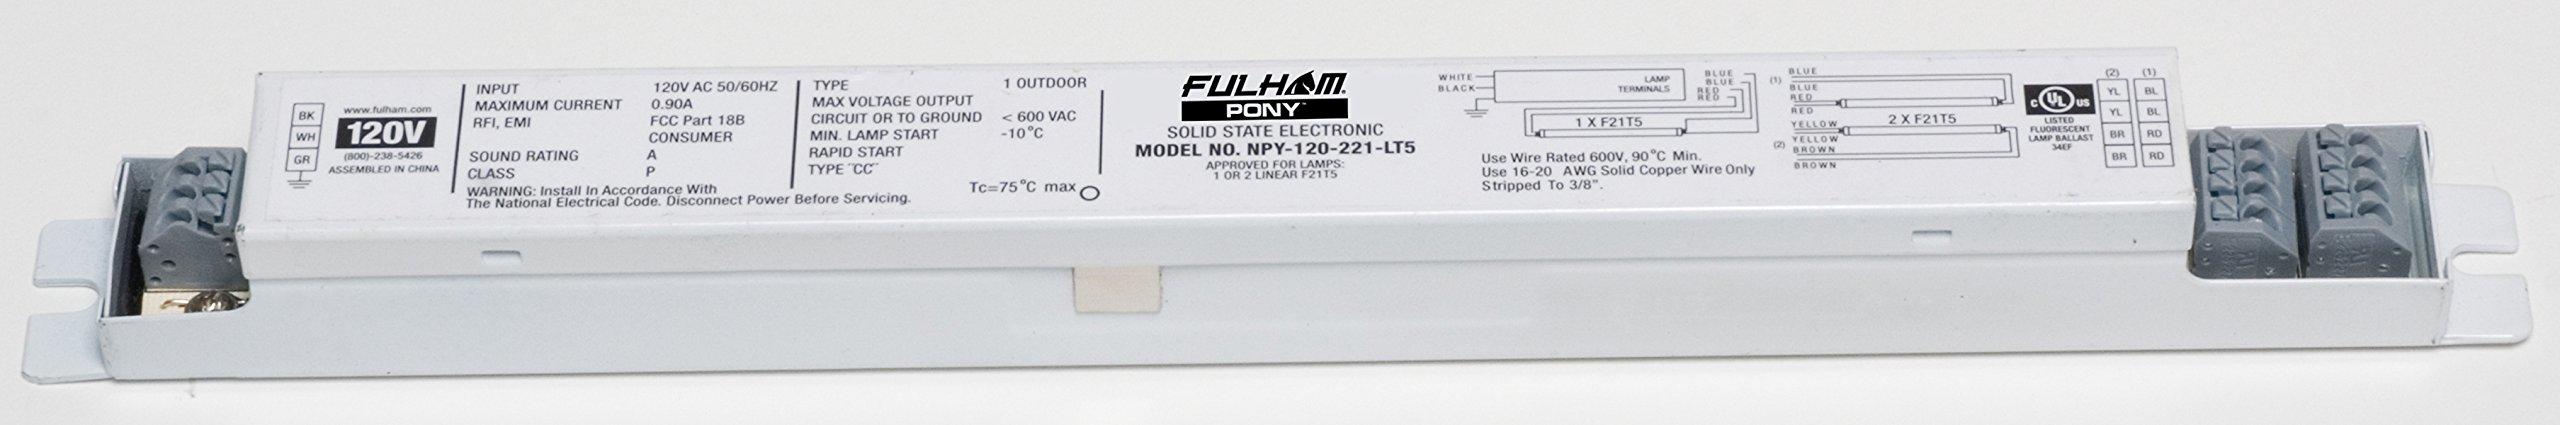 Fulham NPY-120-221-LT5 Pony Ballast